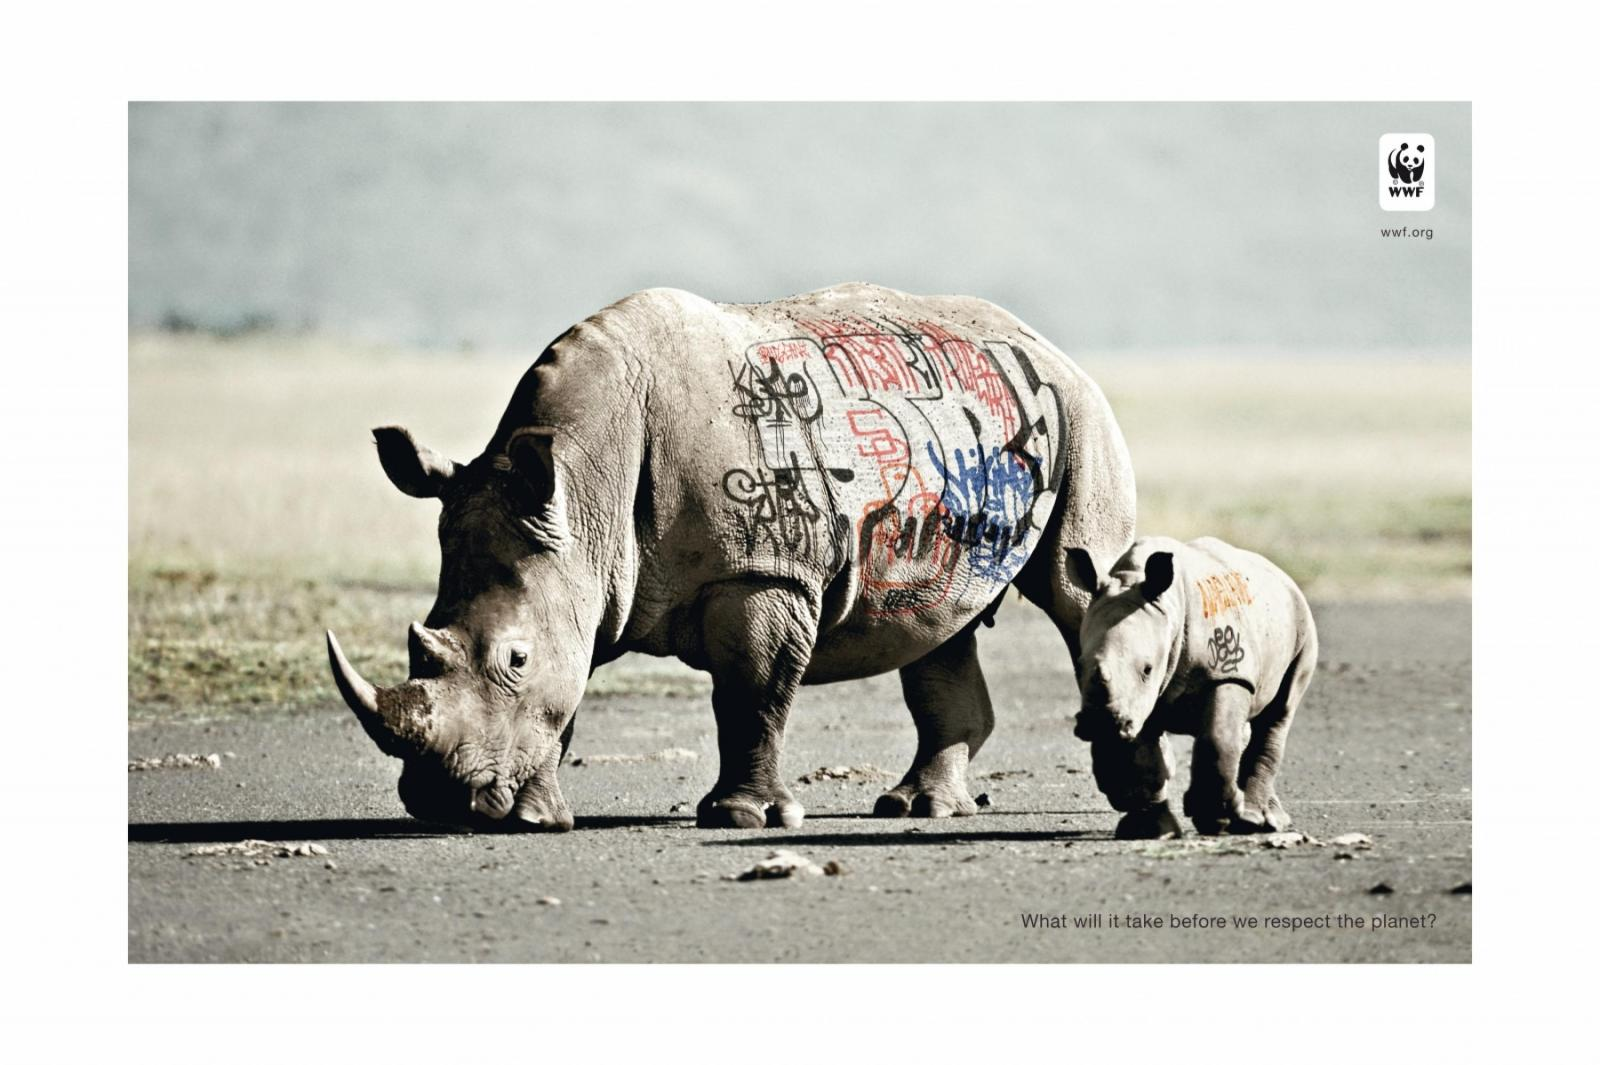 rinoceronte, animal, wwf, grafitti, respeito pelo planeta